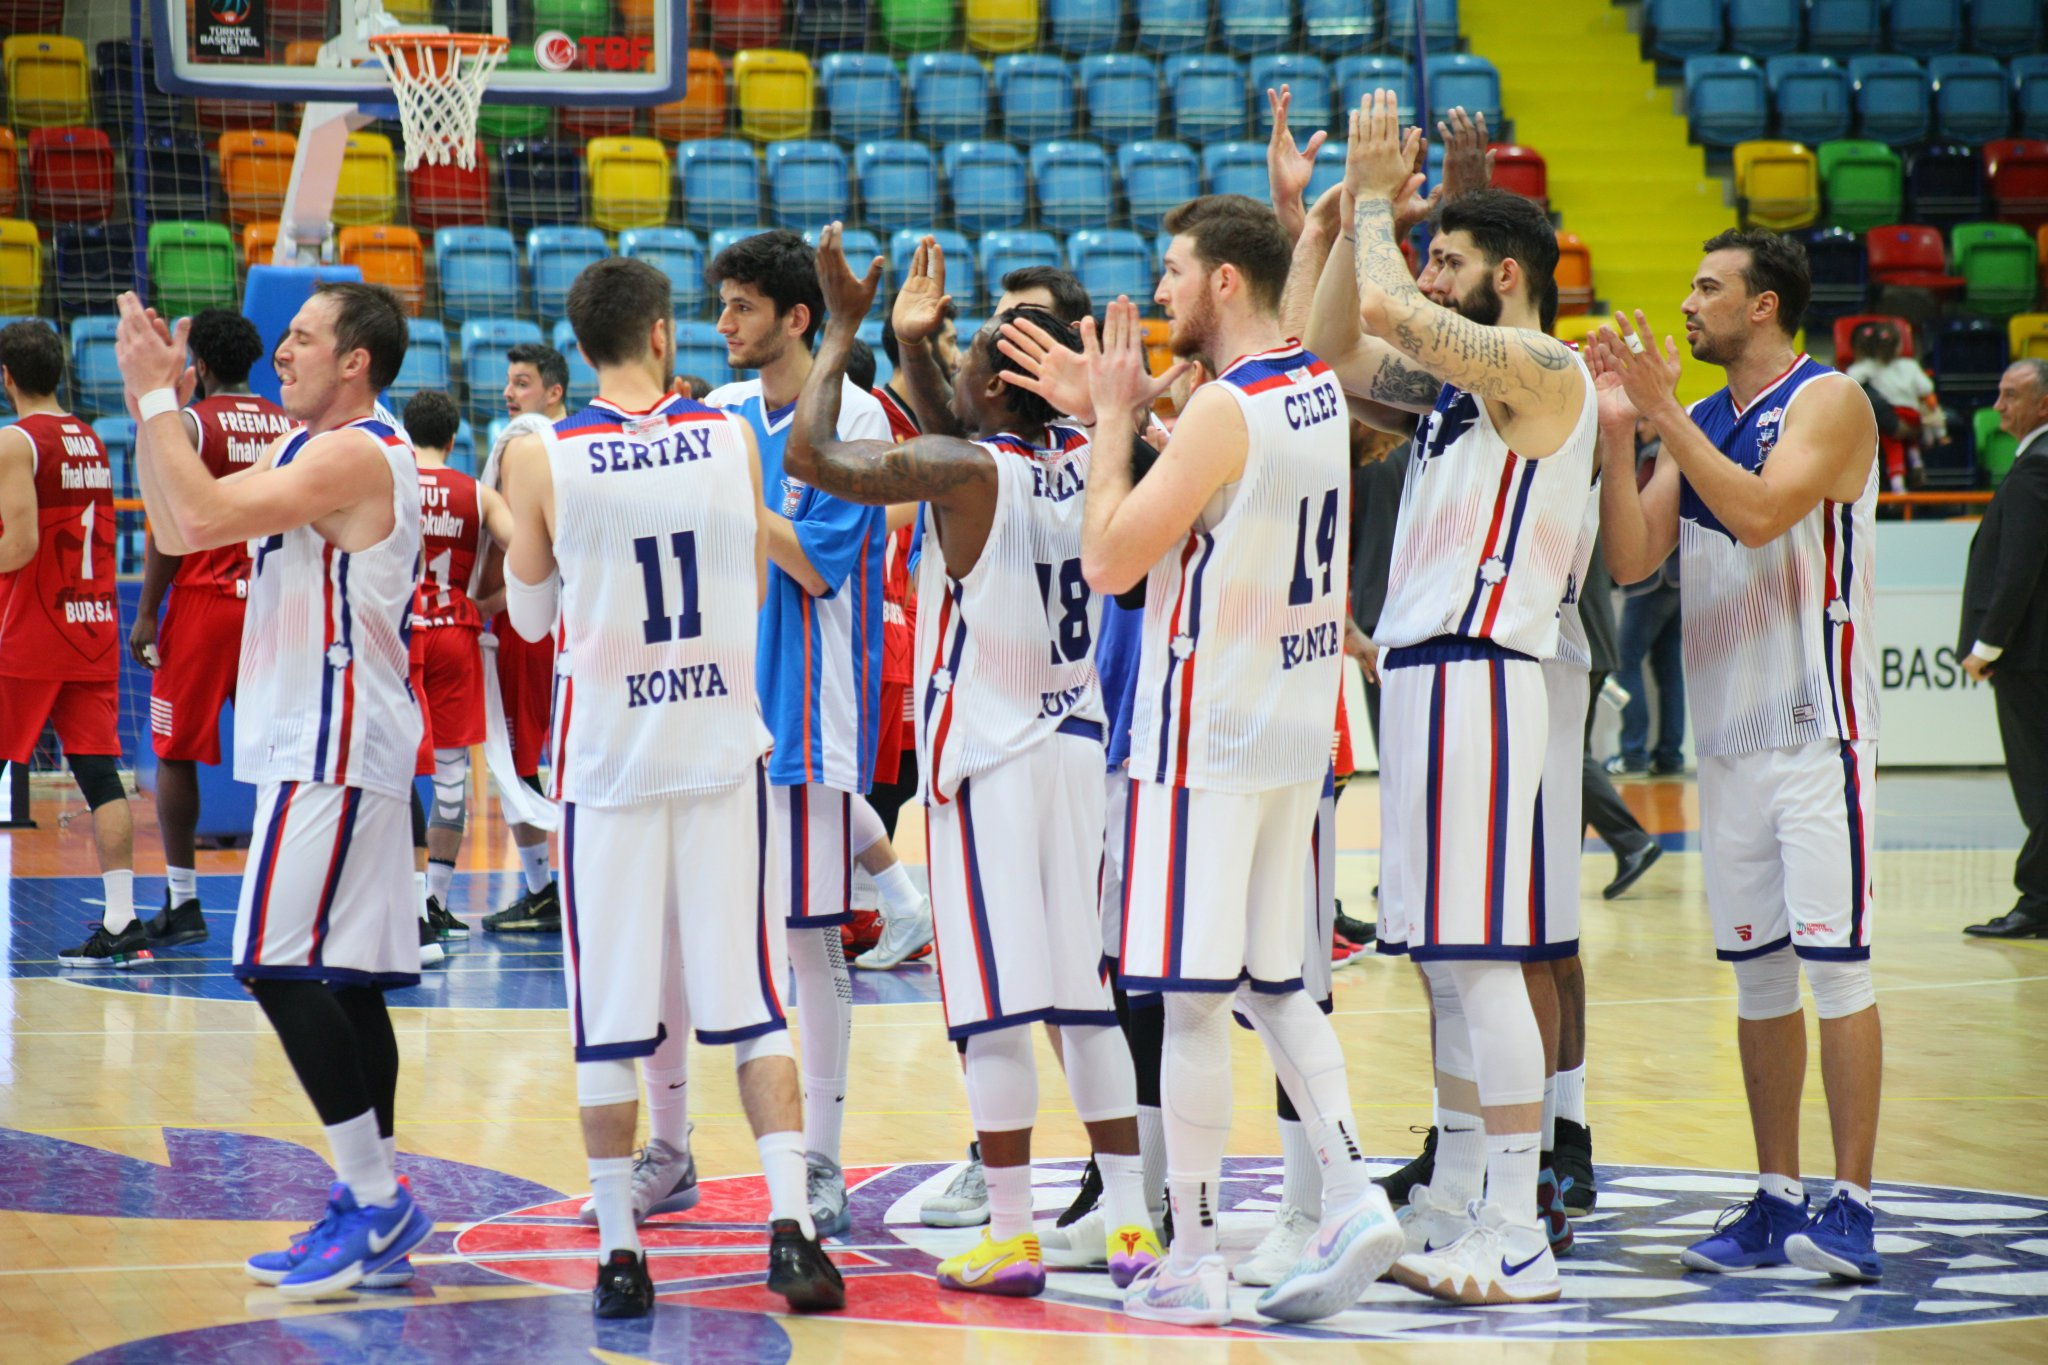 İTÜ:93- Selçuklu Basketbol: 96